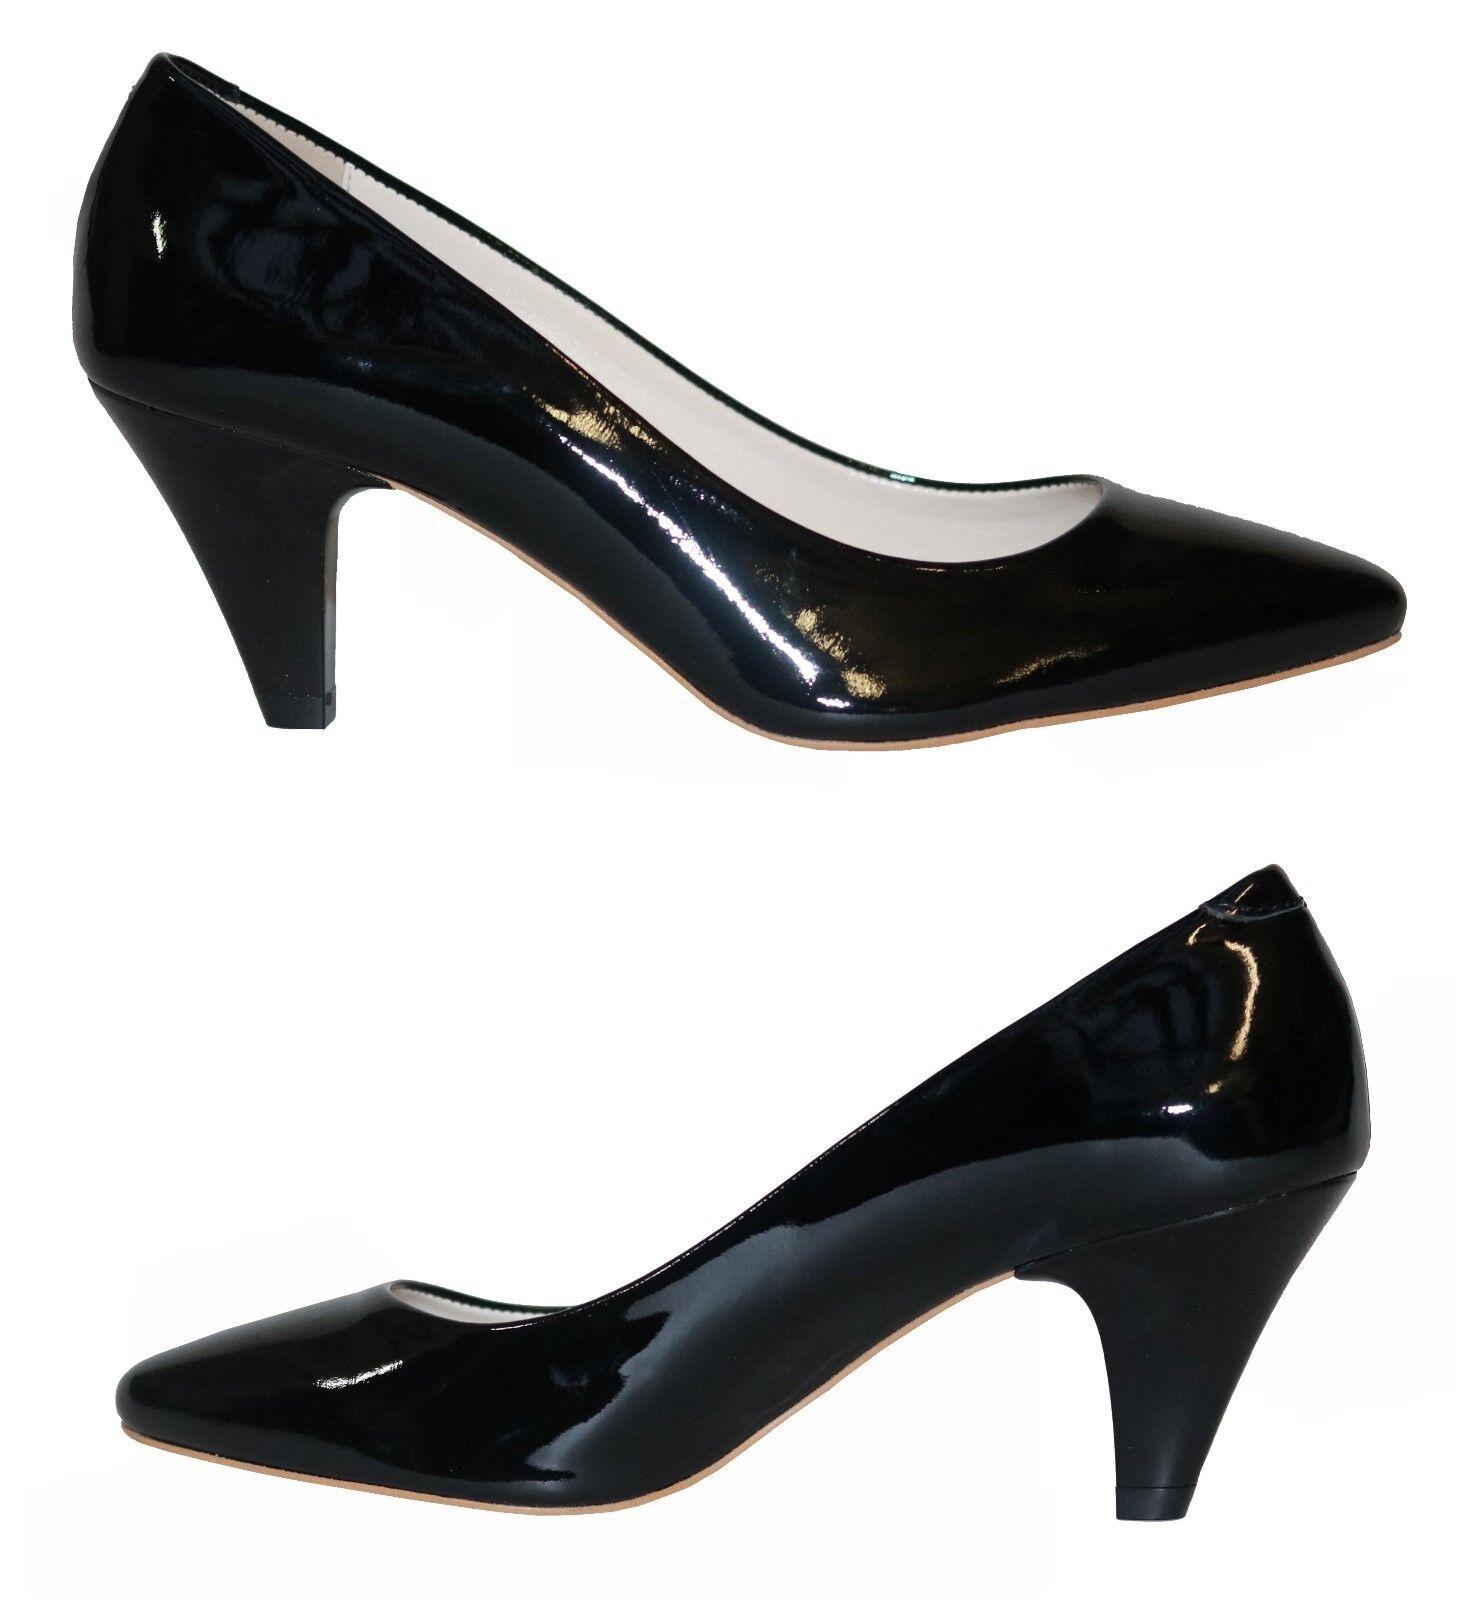 Damen Schuhe Pumps Elegant Gr.38 Schwarz